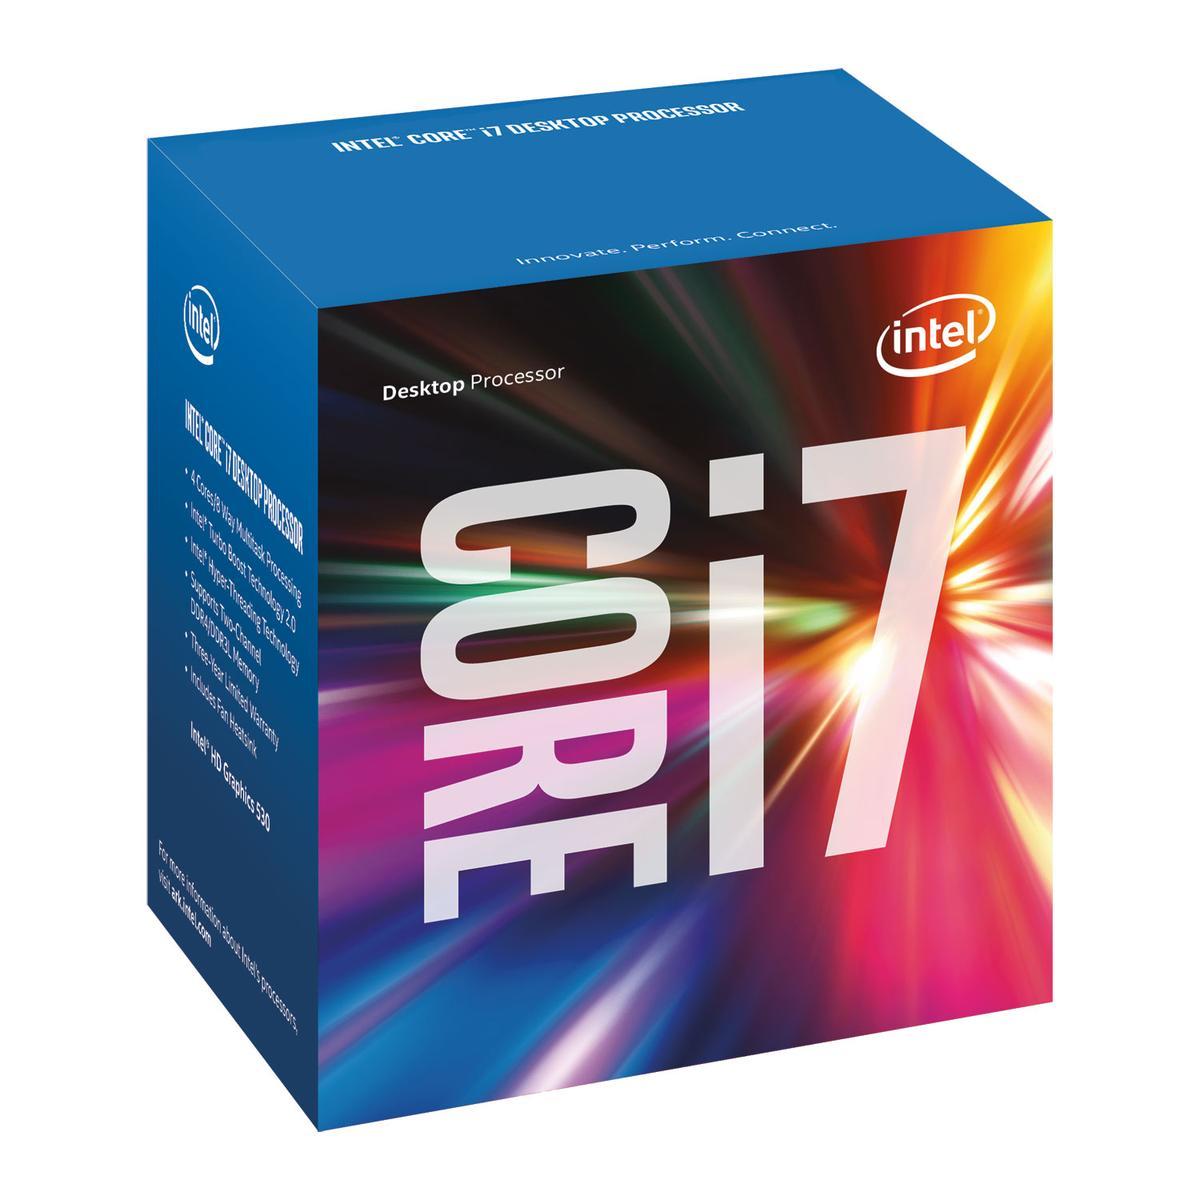 Intel Core i7-6700 3.4 GHz Quad-Core